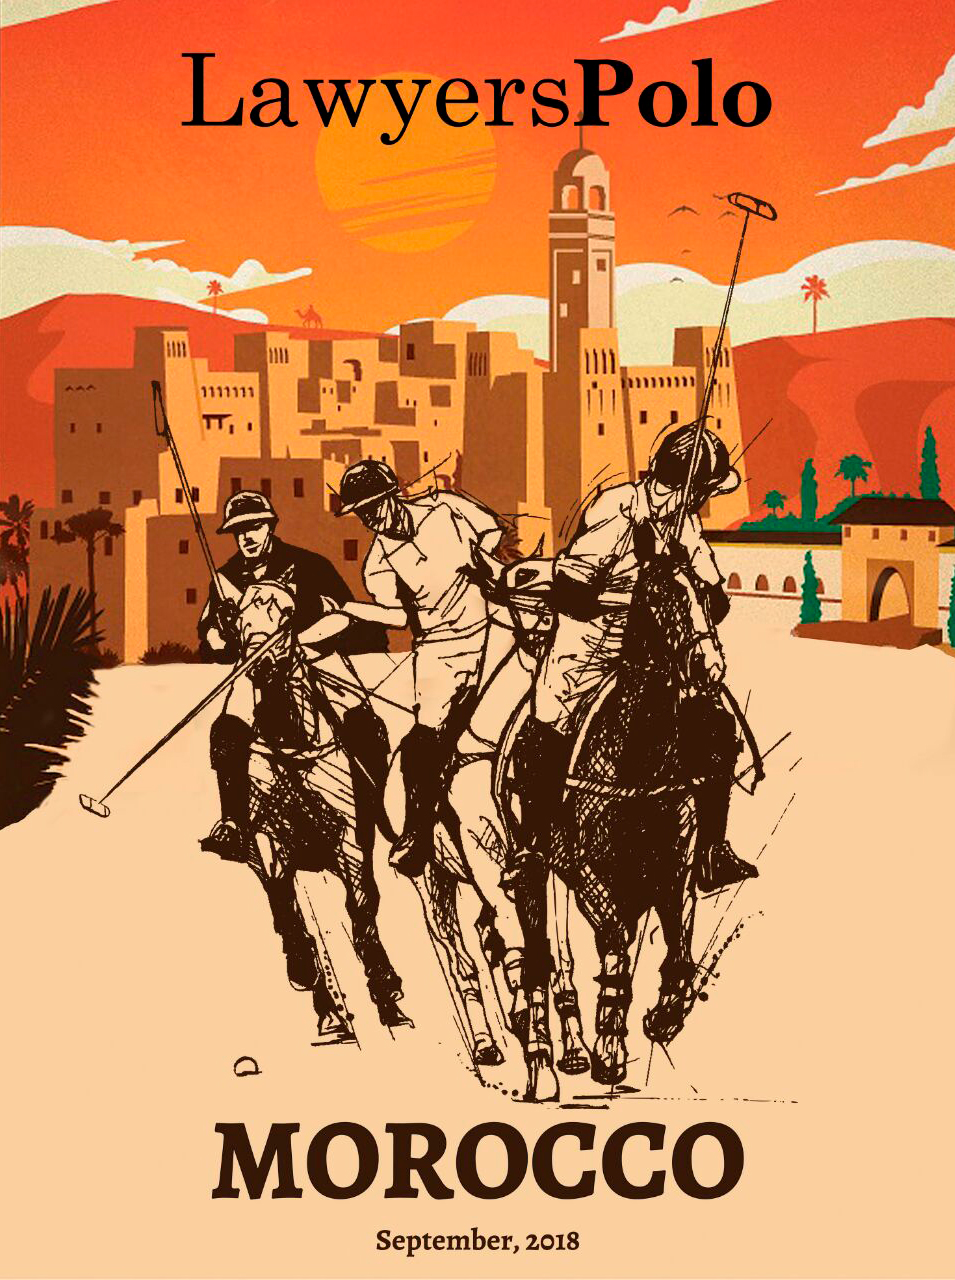 morocco2018.jpg